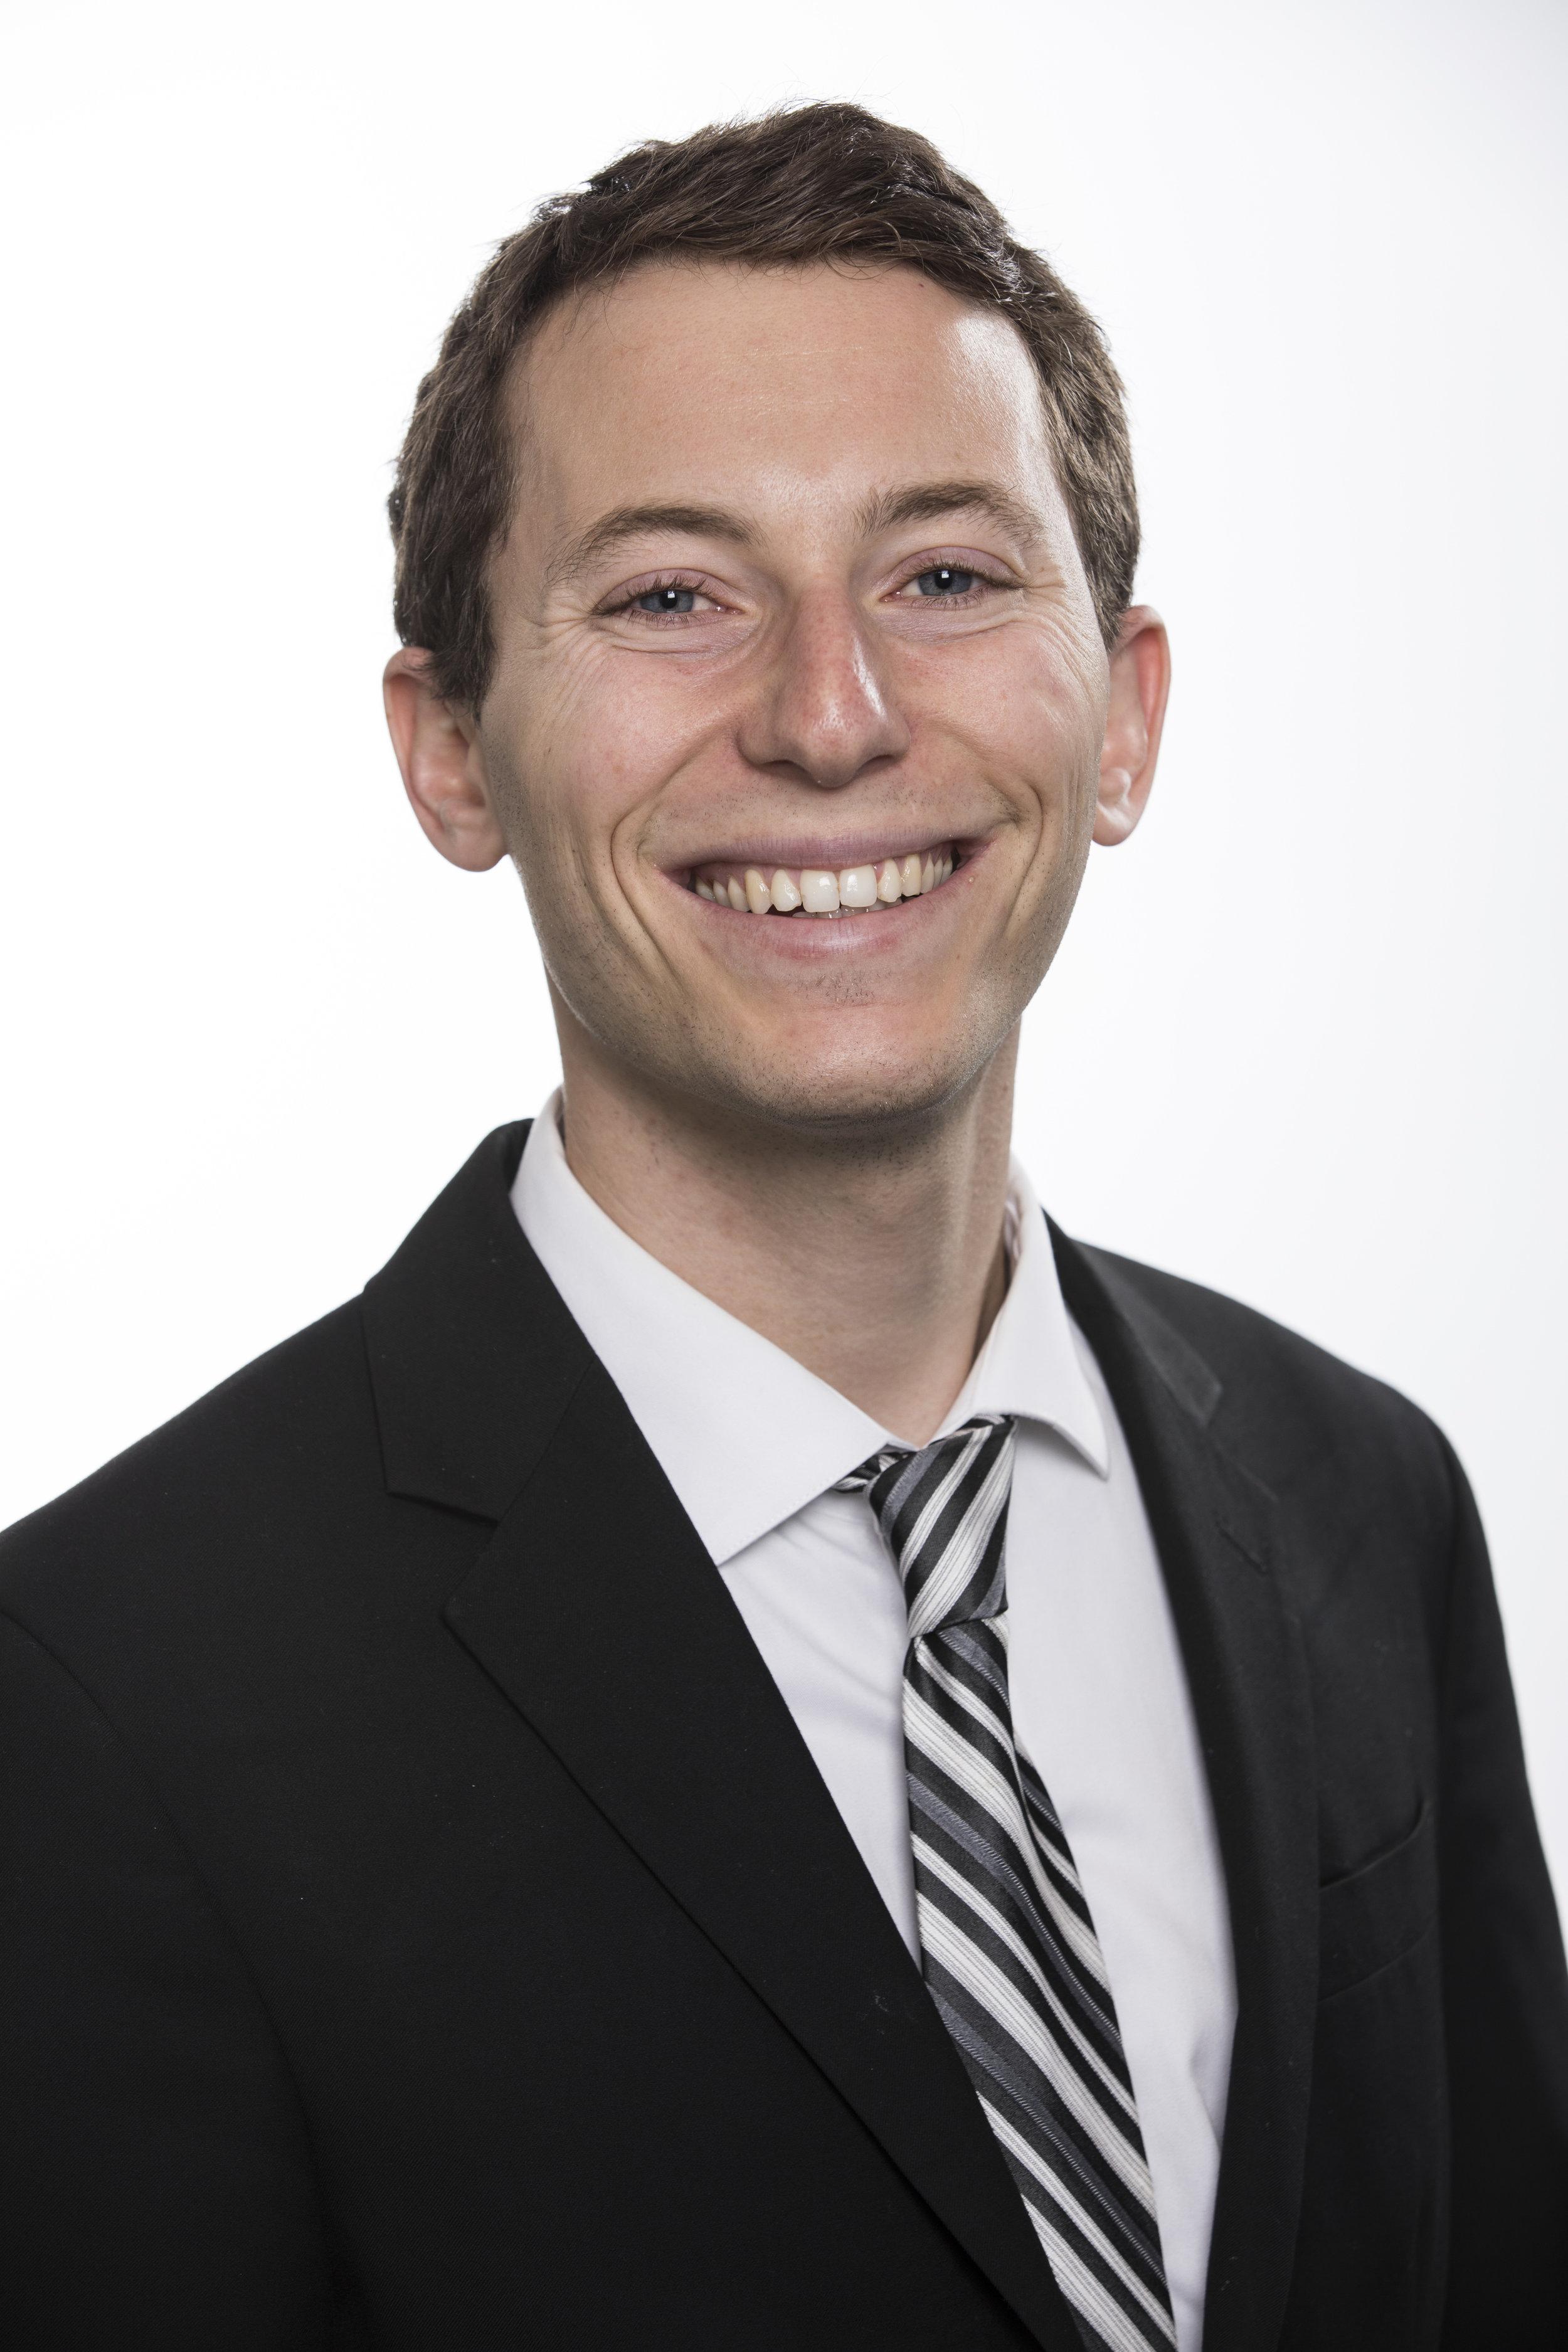 Scott Breen - Associate Manager Sustainability and Circular Economy Program